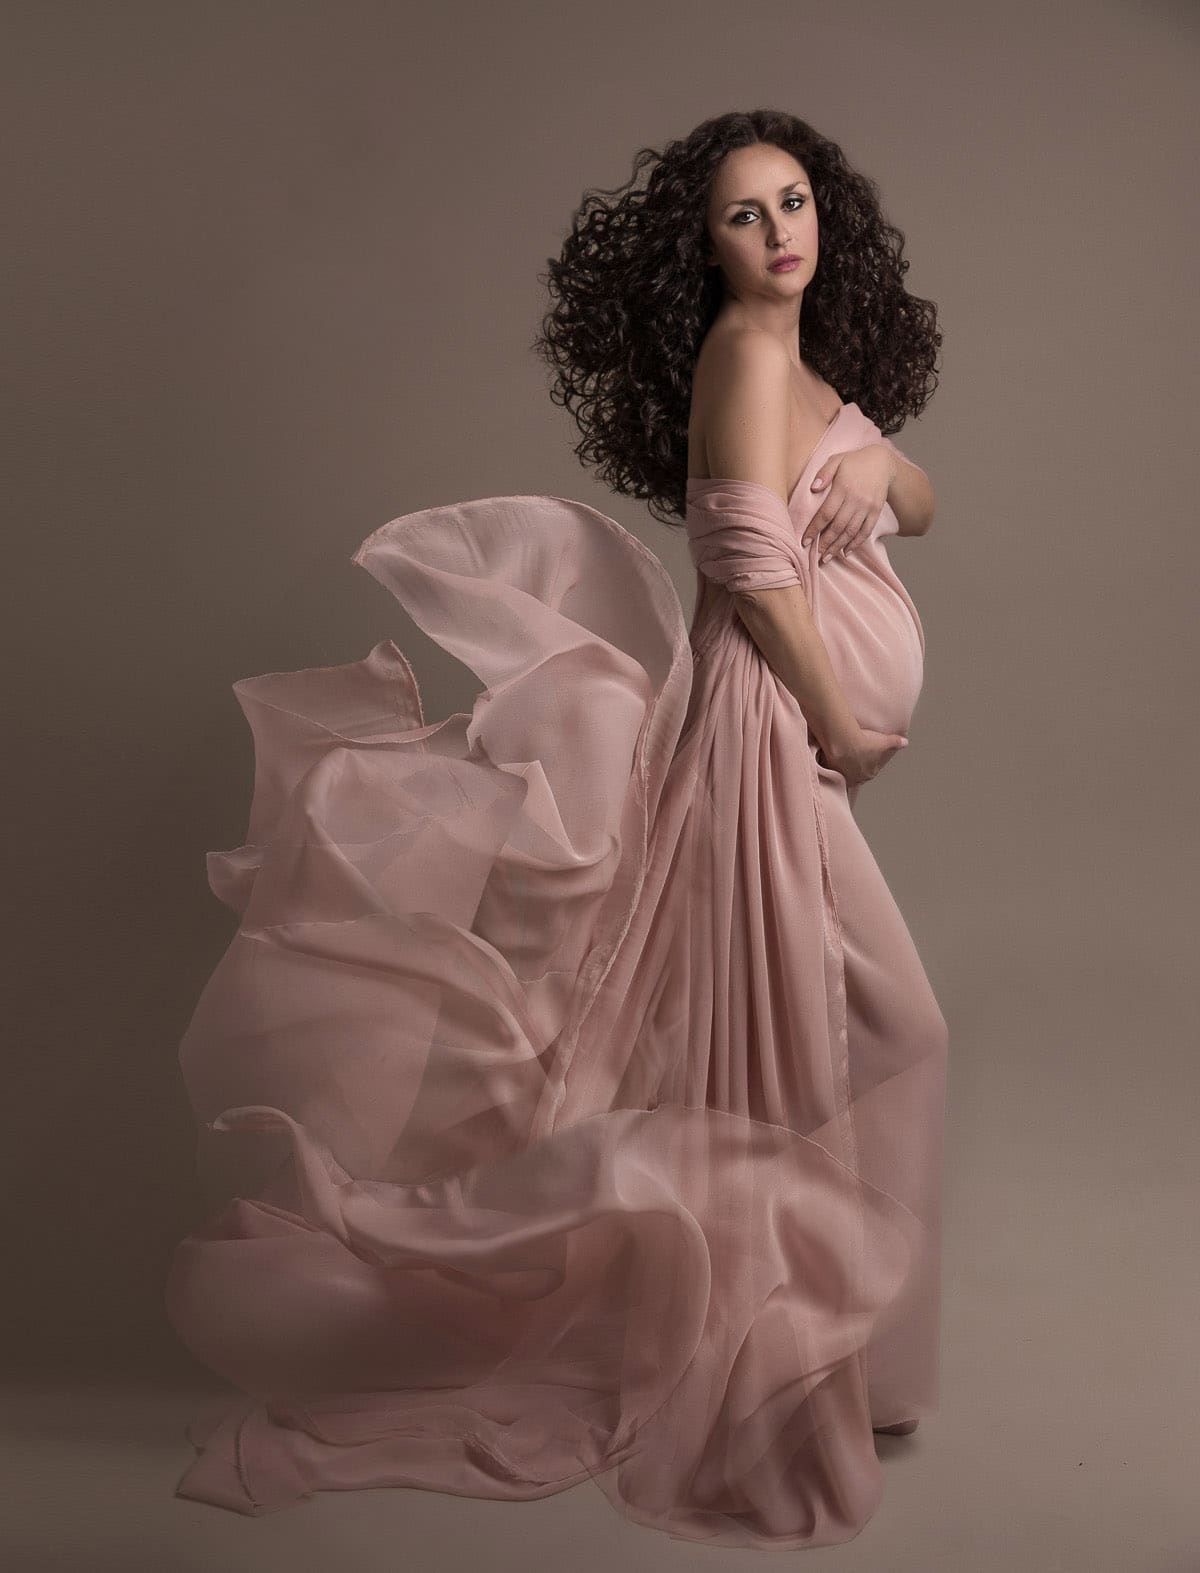 WORKSHOP FOTOGRAFIA MATERNITY NEWBORN PETIT MONDE KRISTINA RECHE 43 - Maternity